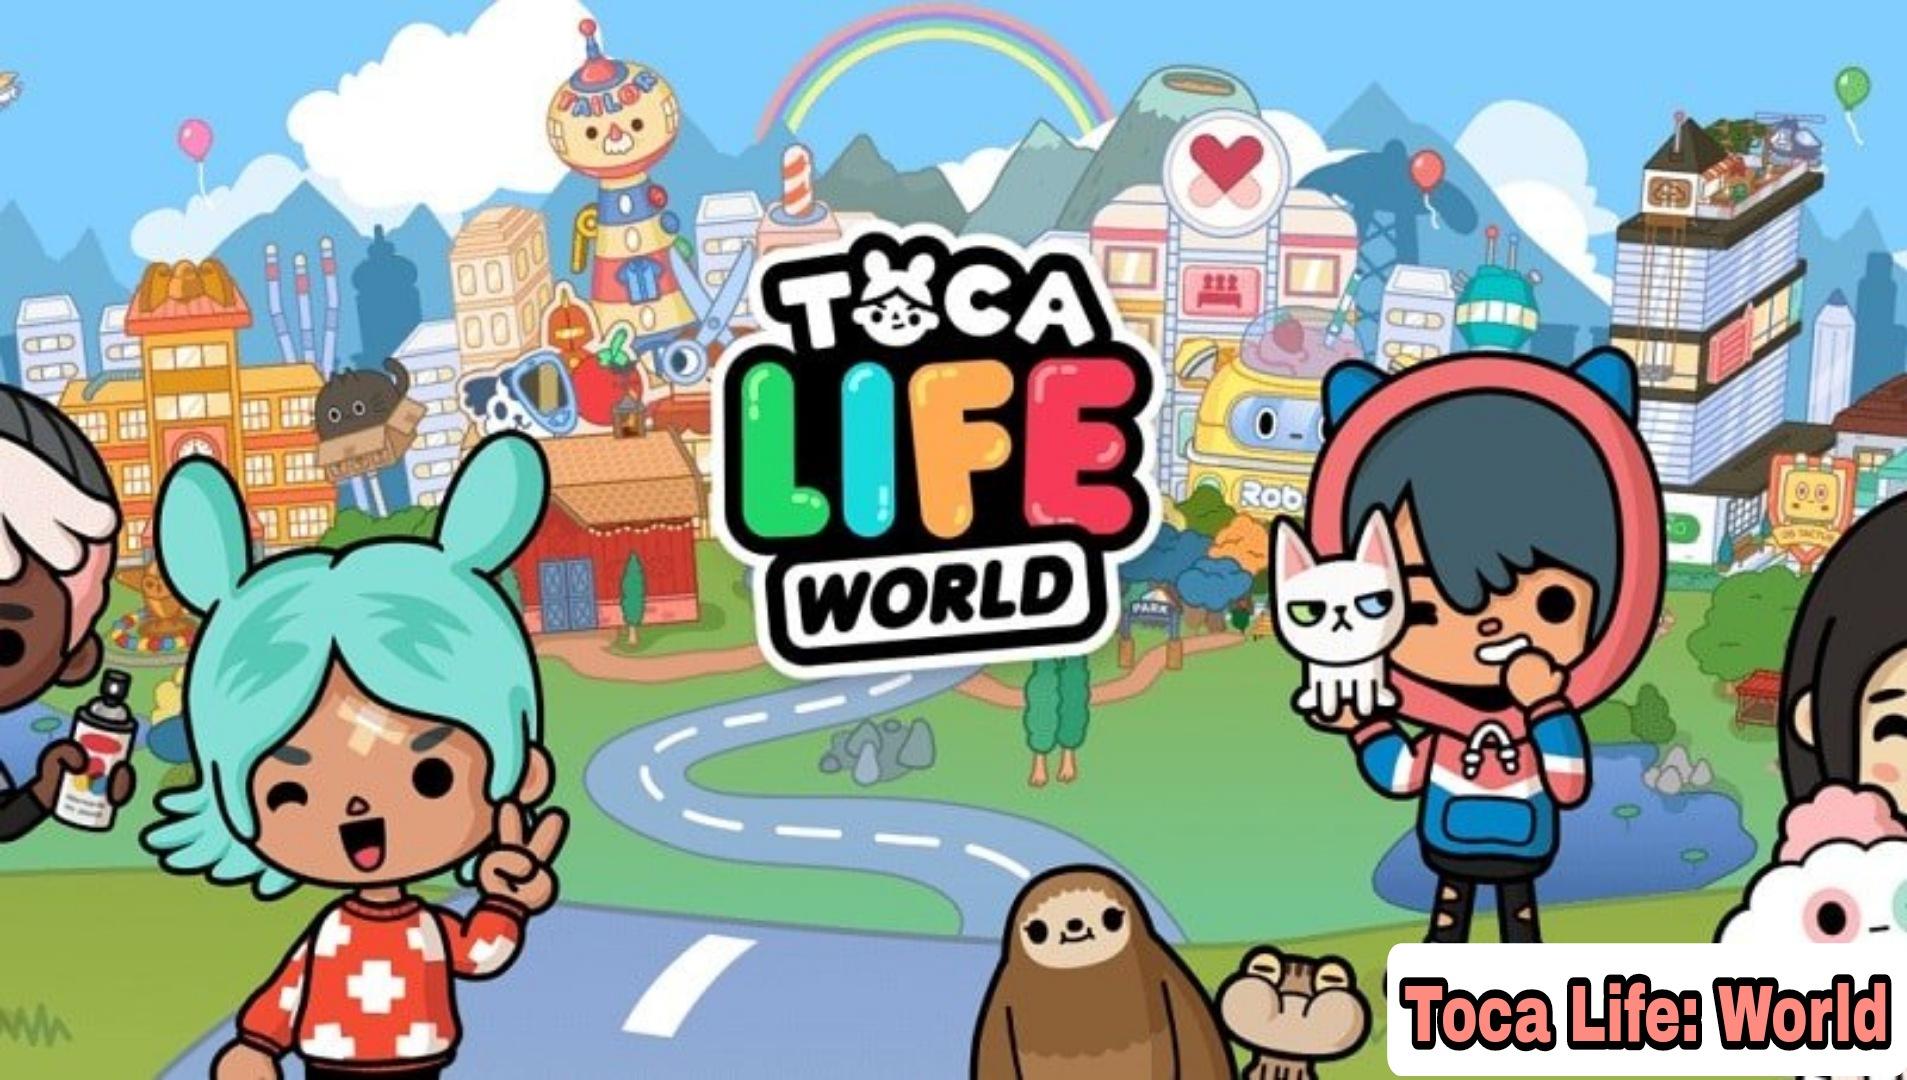 Toca Life: World MOD APK v1.36 Download (All Unlocked)